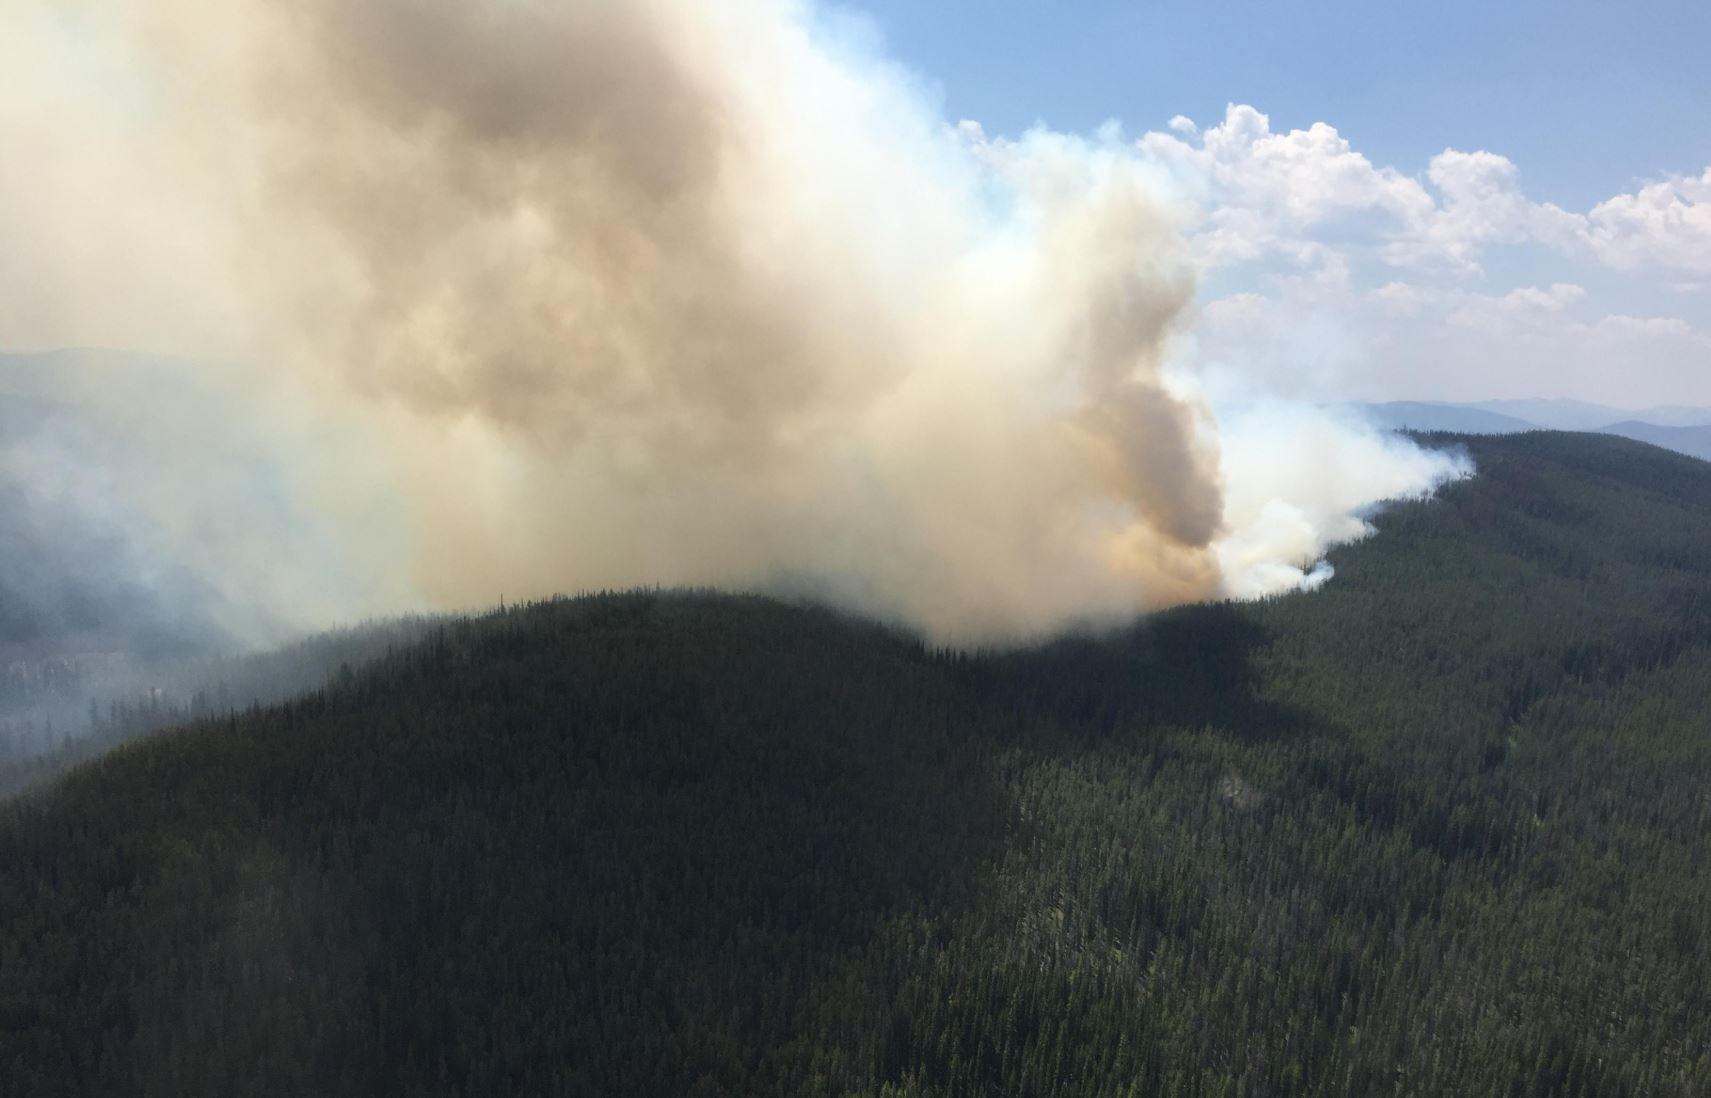 The Reynolds Lake Fire (inciweb.org photo)